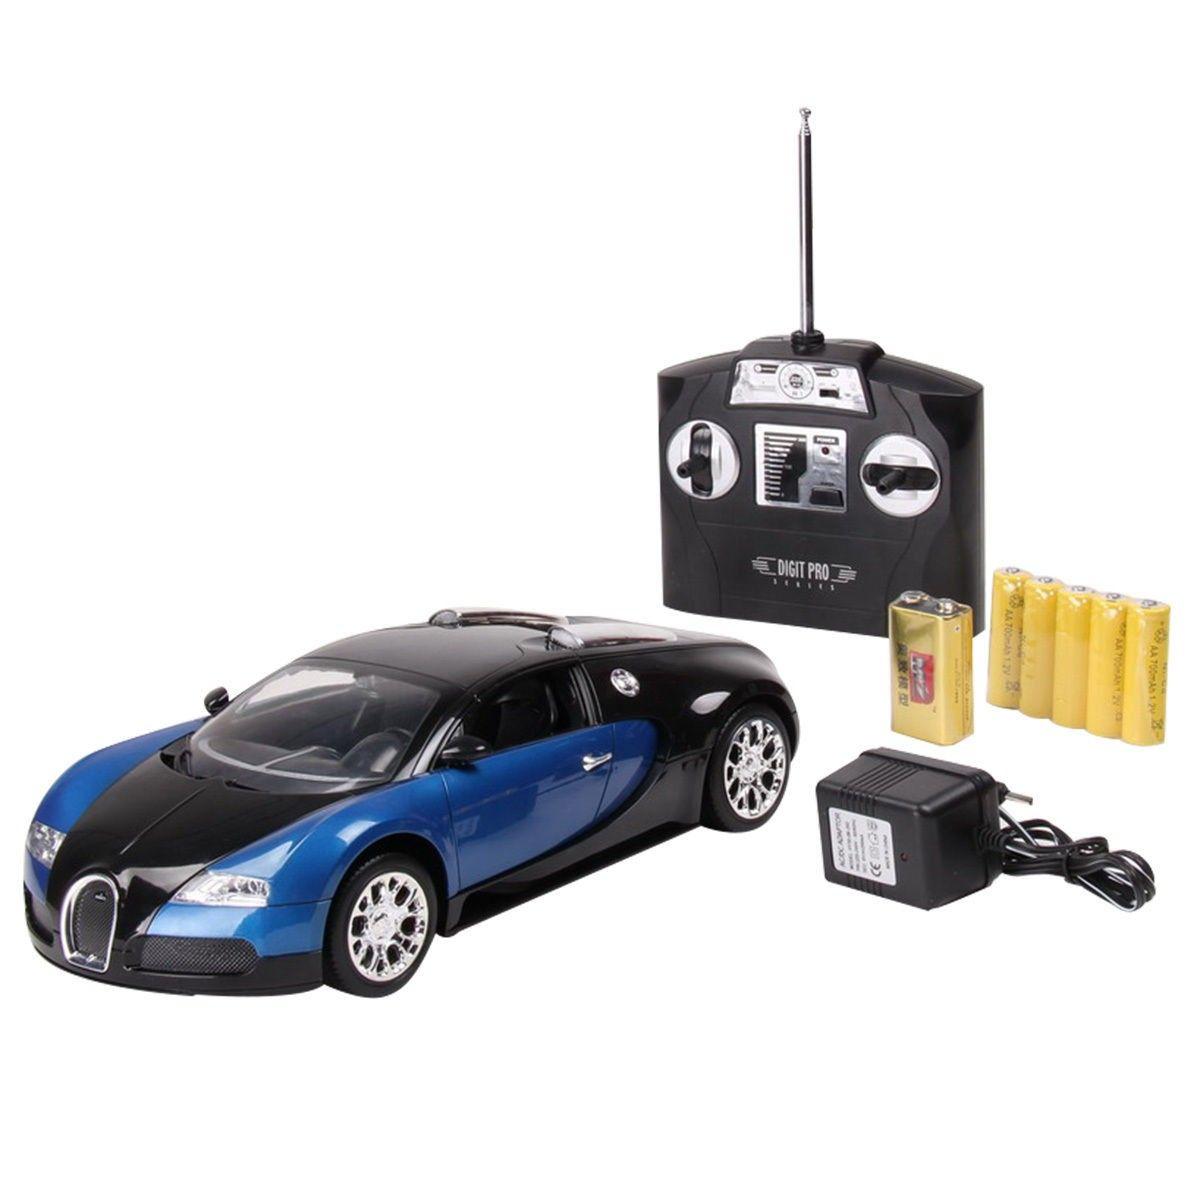 bugatti veyron 16 4 grand sport car radio remote control. Black Bedroom Furniture Sets. Home Design Ideas